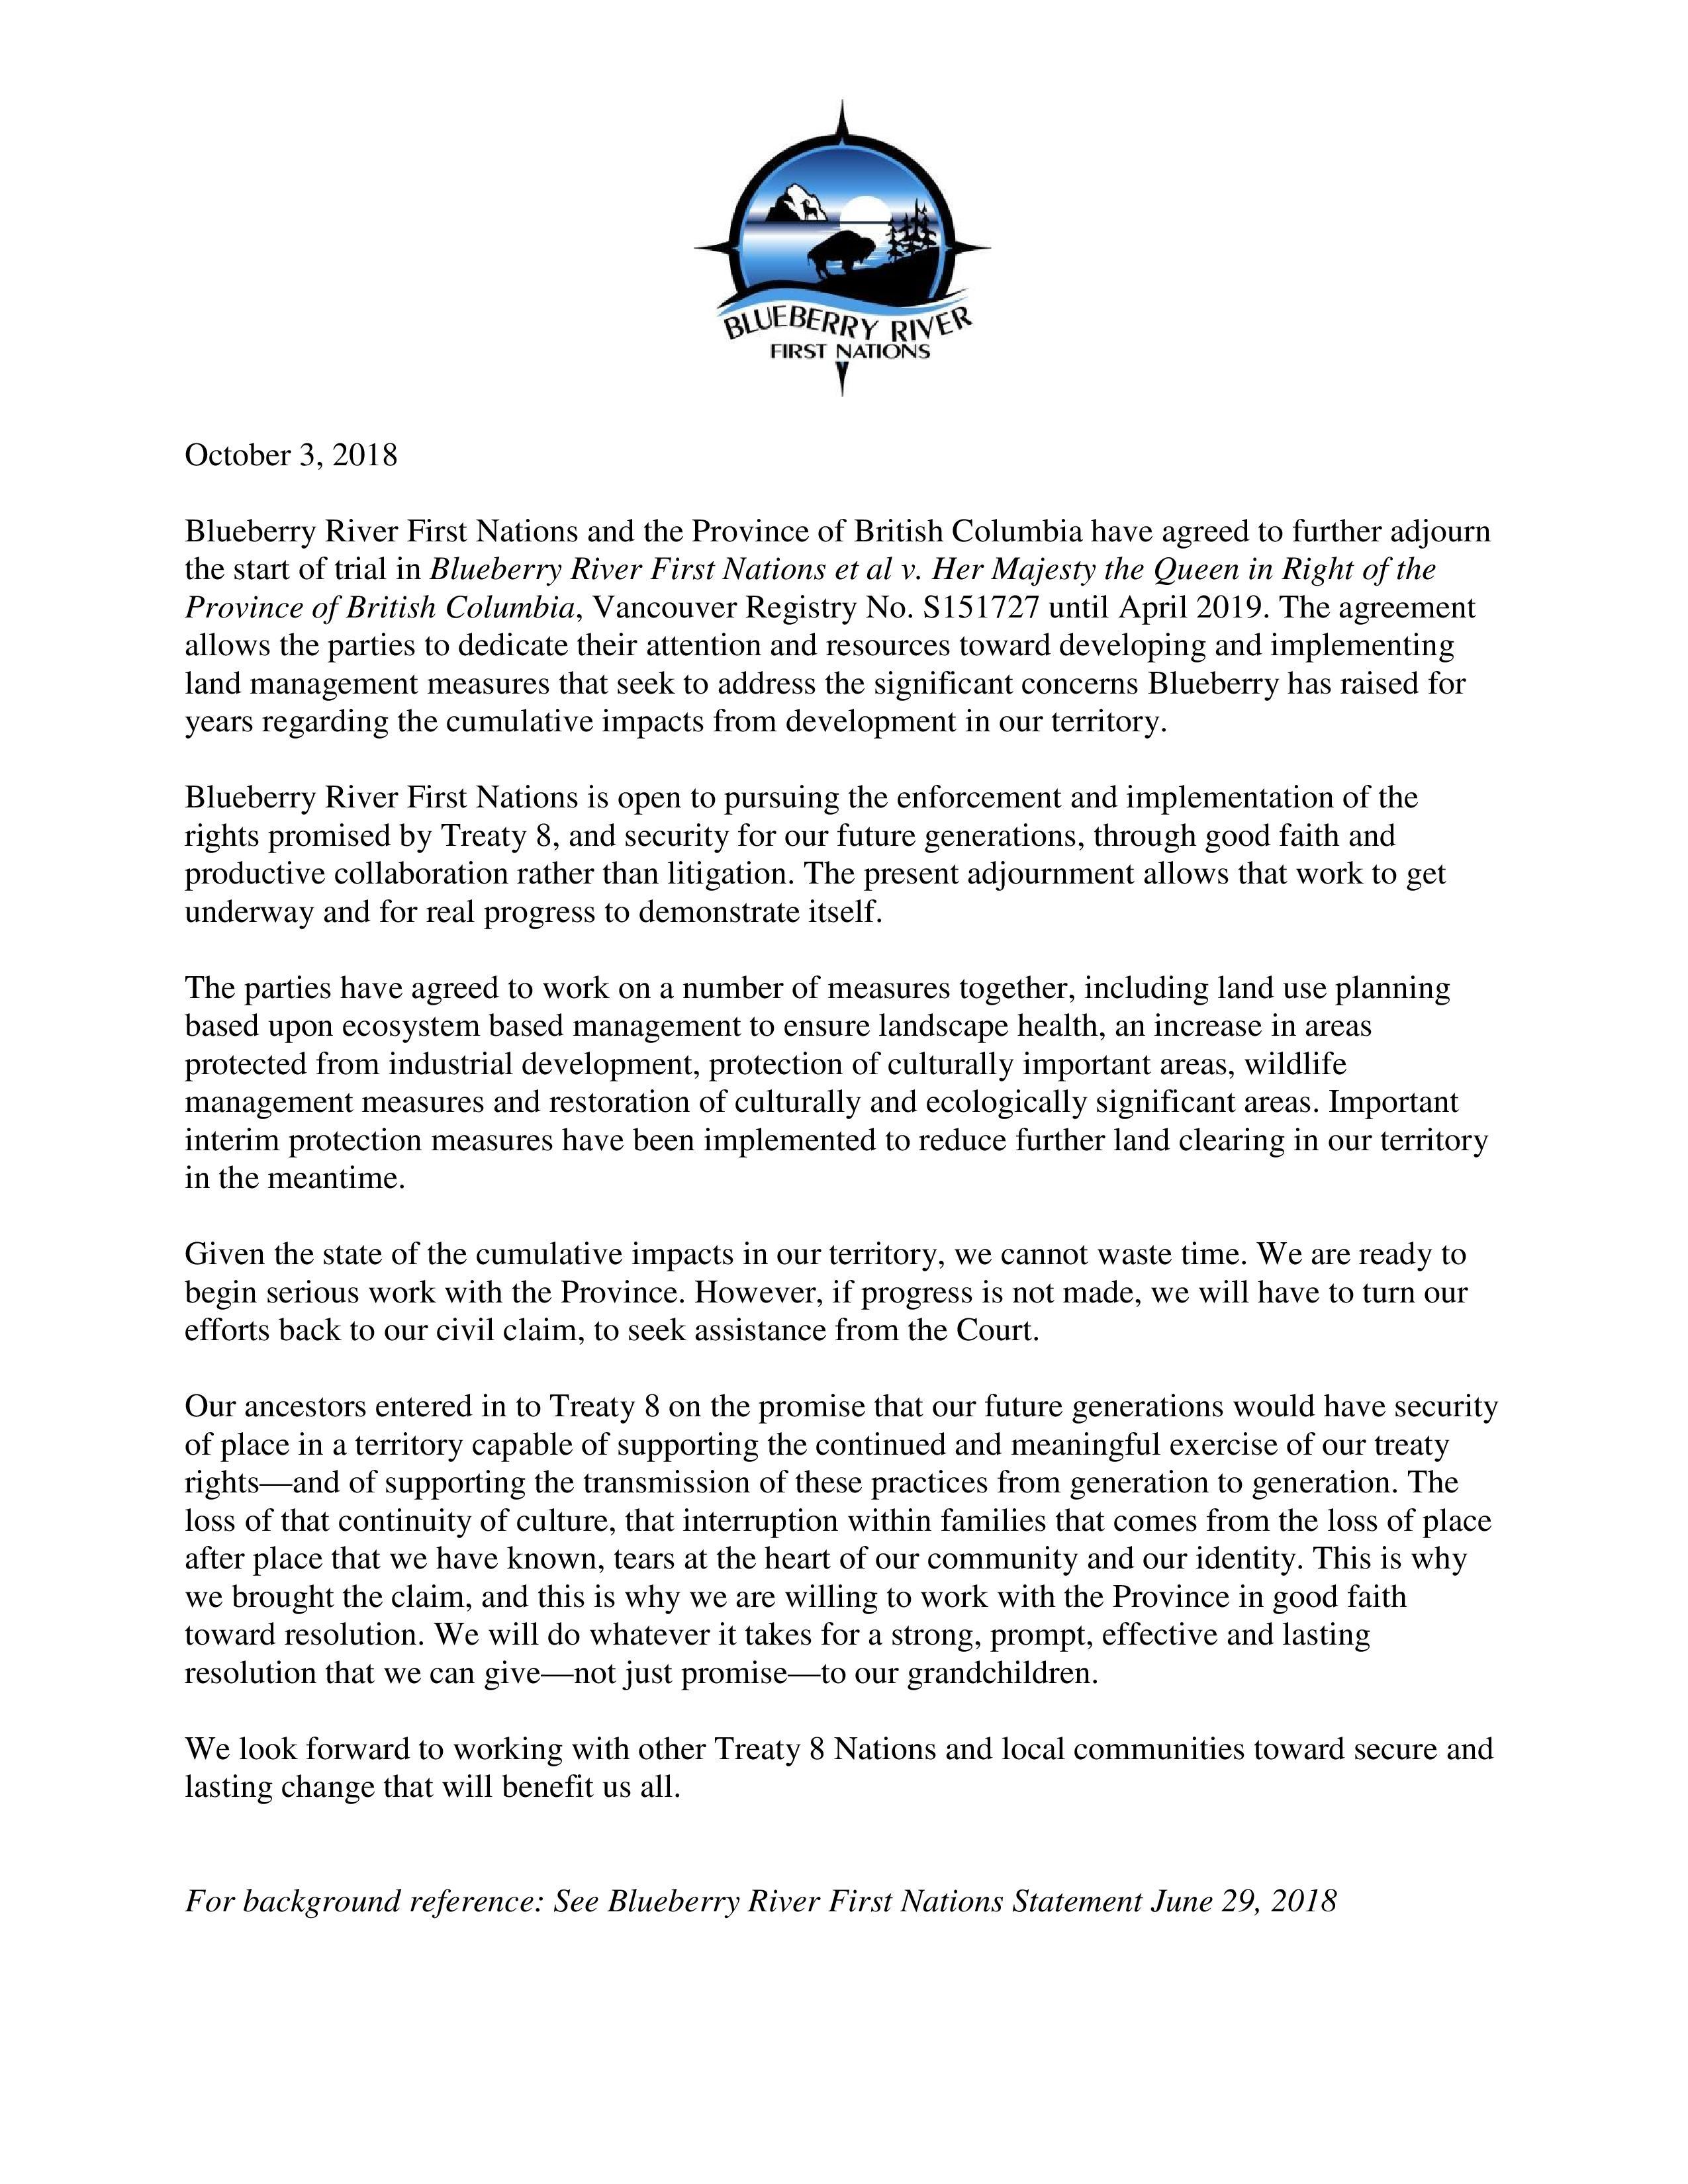 2018-10-02 BRFN Statement on Further Adjournment (01566452)-page-001 (1)